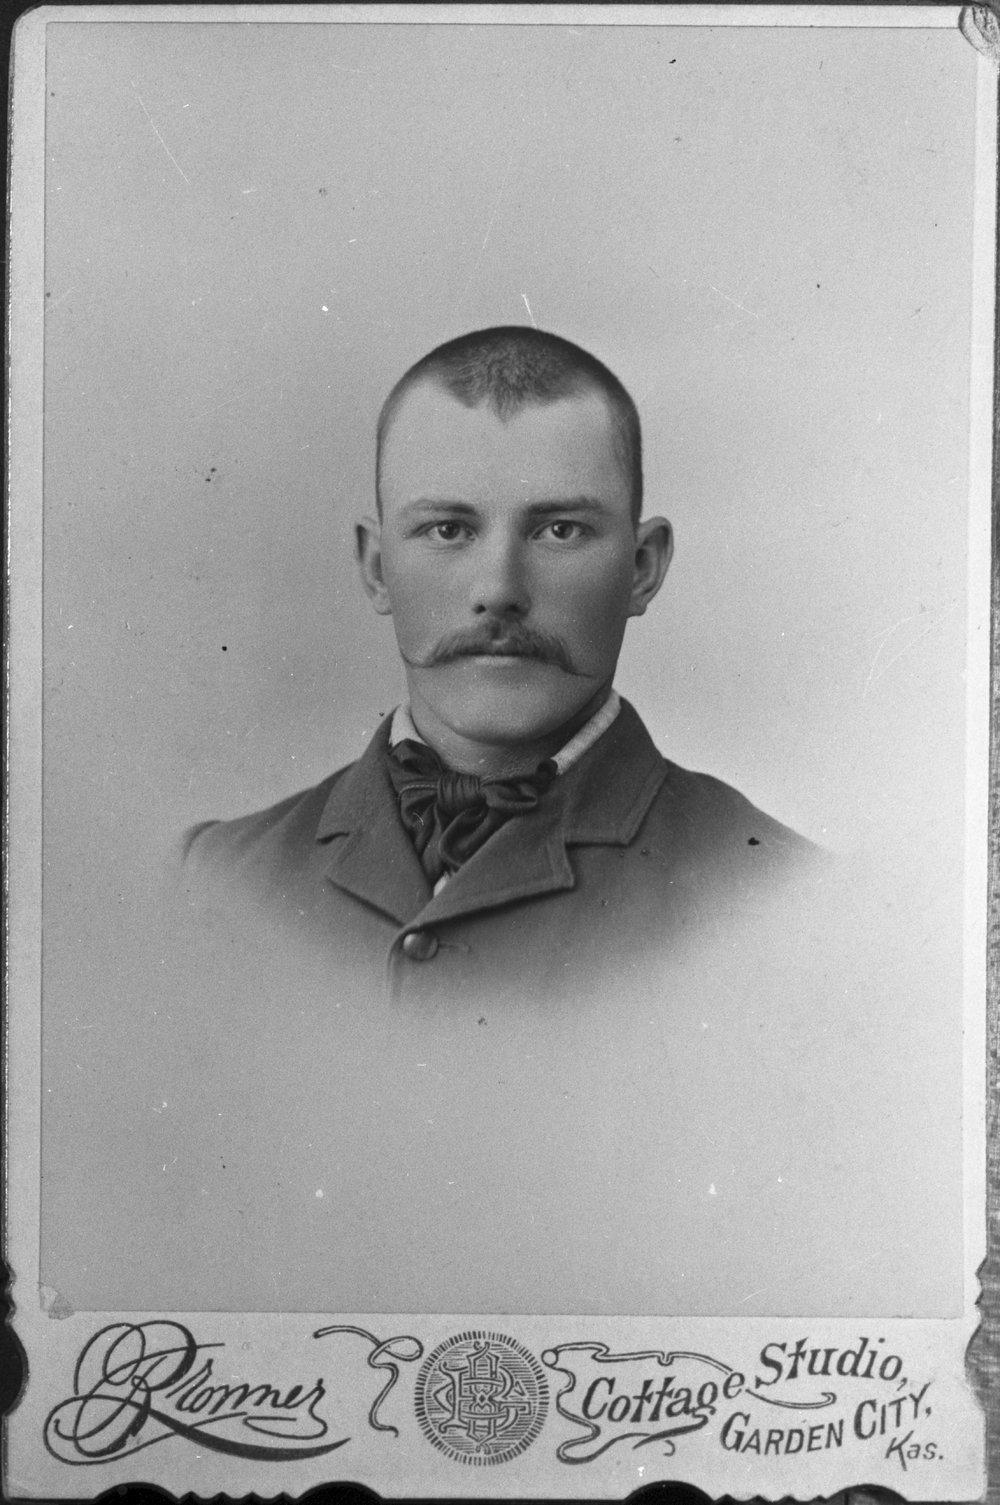 L. O. Sutton